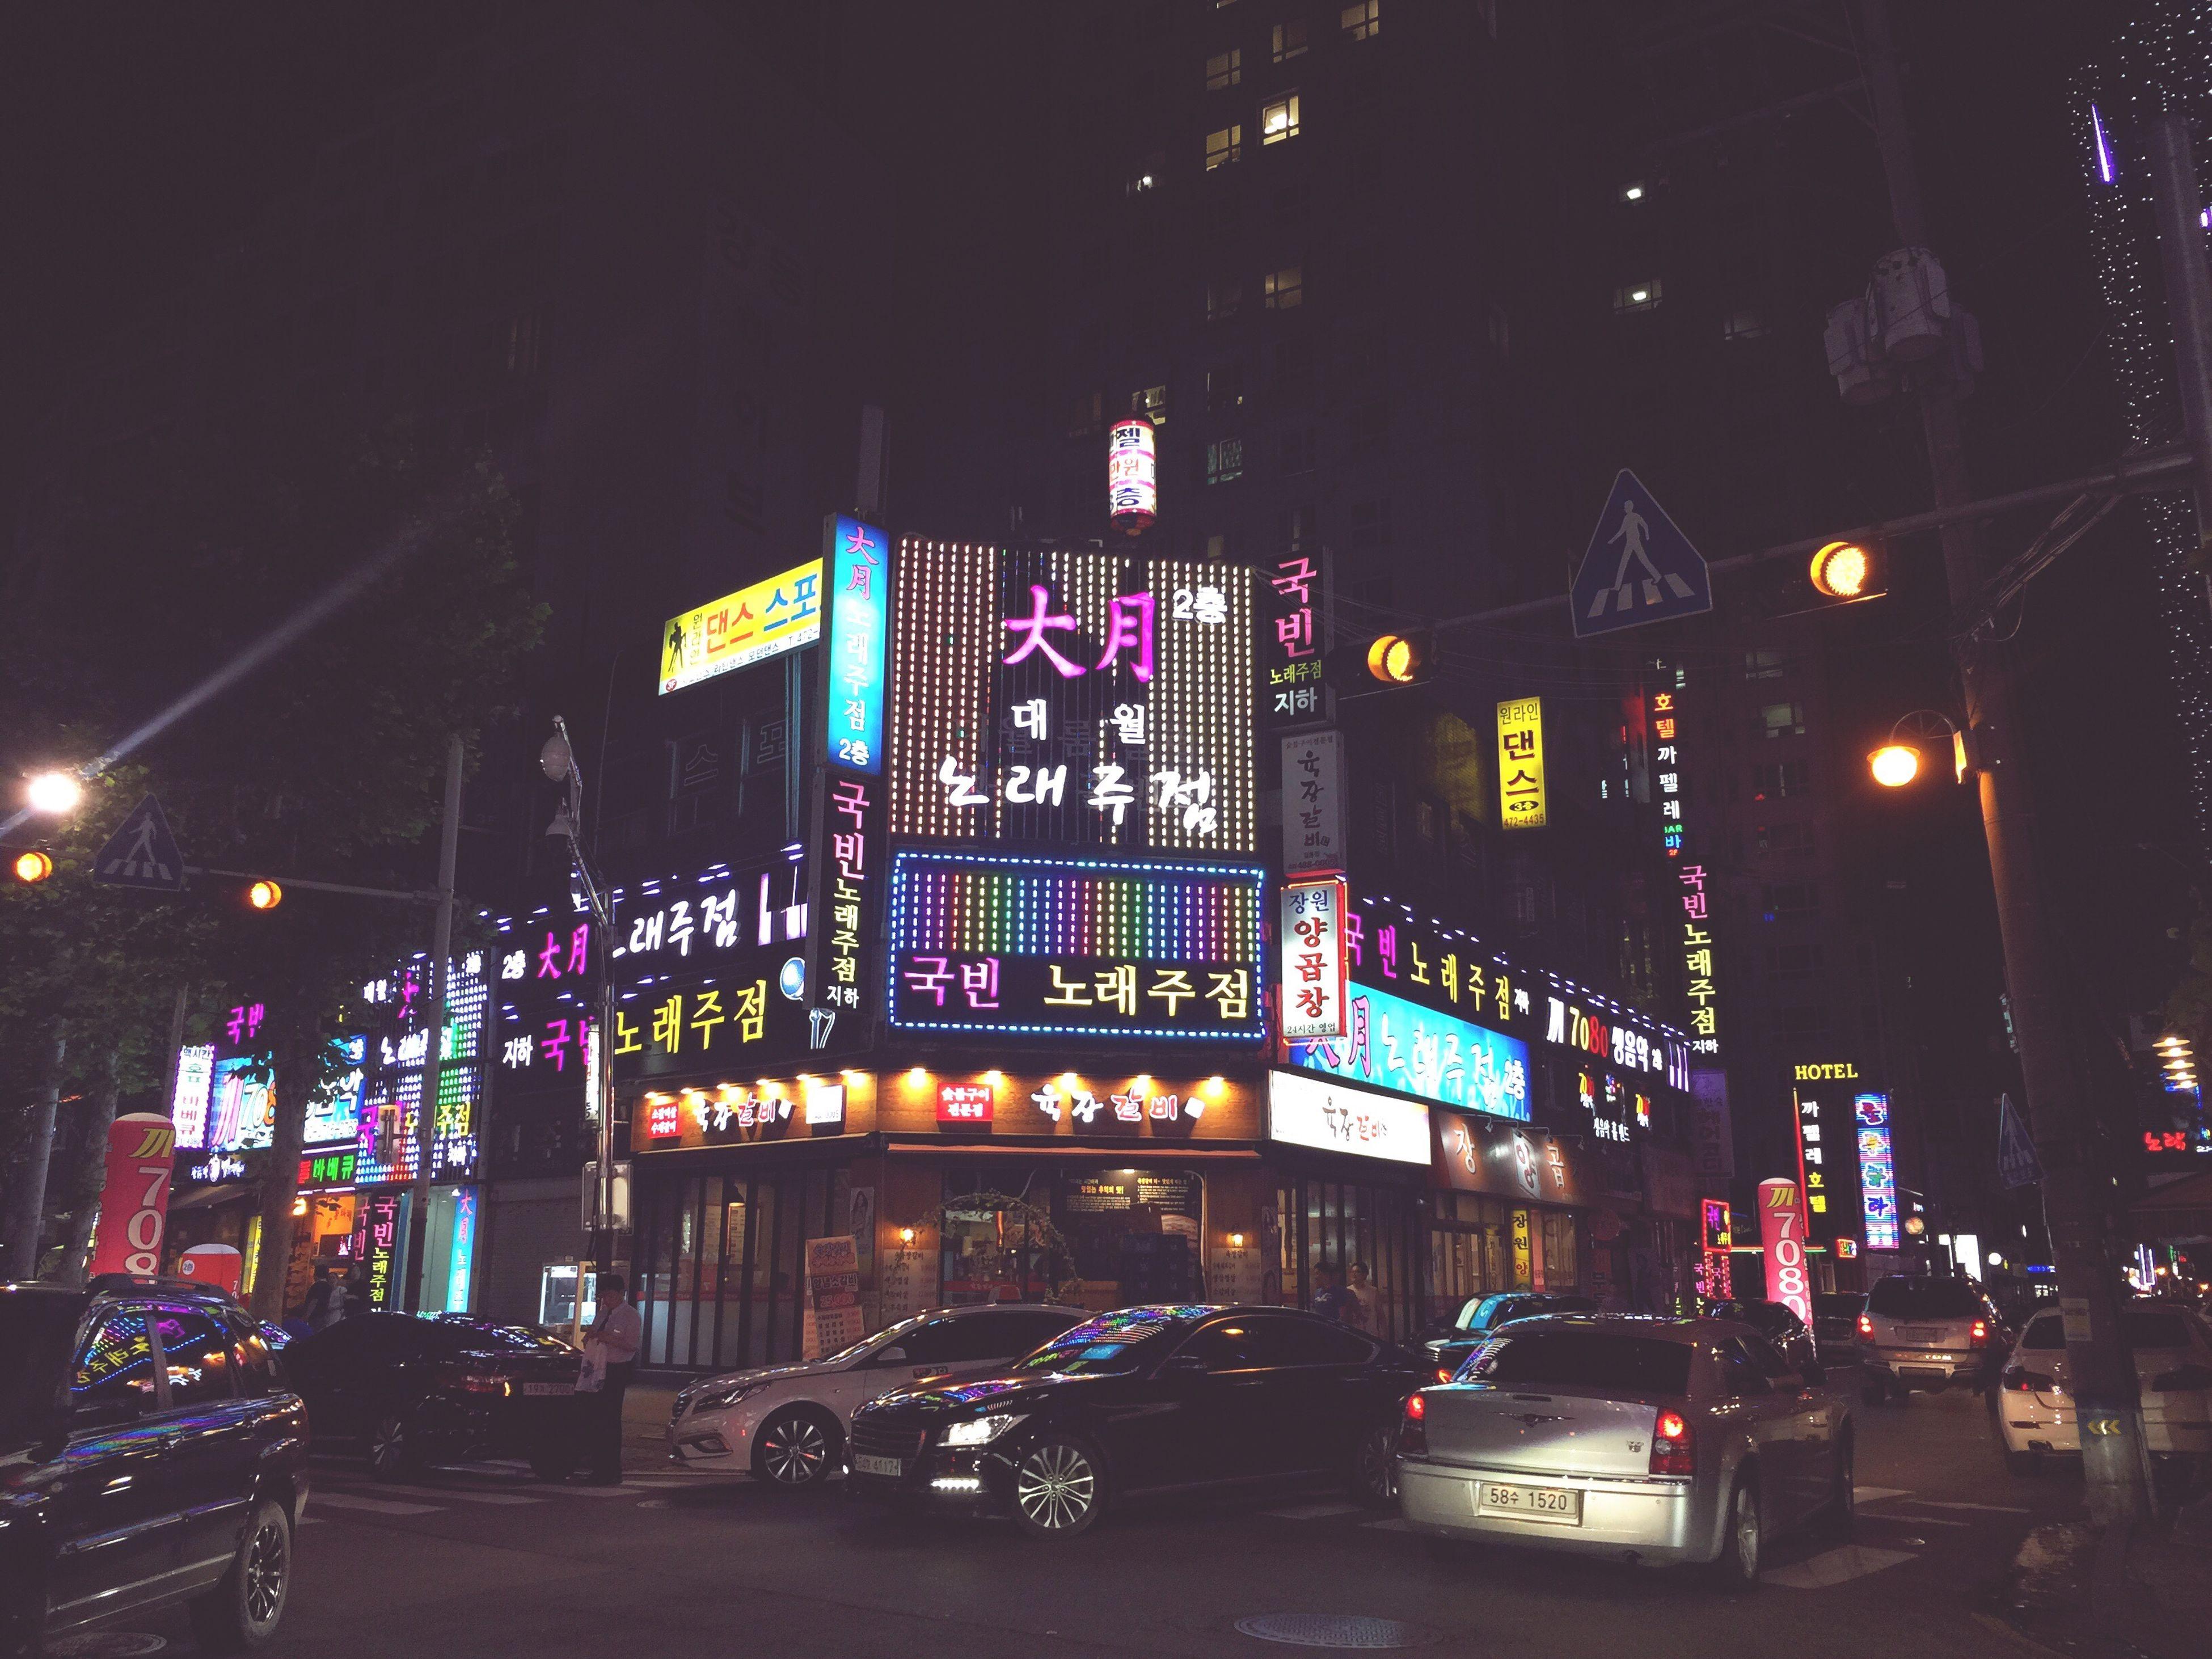 illuminated, night, architecture, built structure, city, city life, street light, city street, road, outdoors, sky, travel destinations, modern, information sign, dark